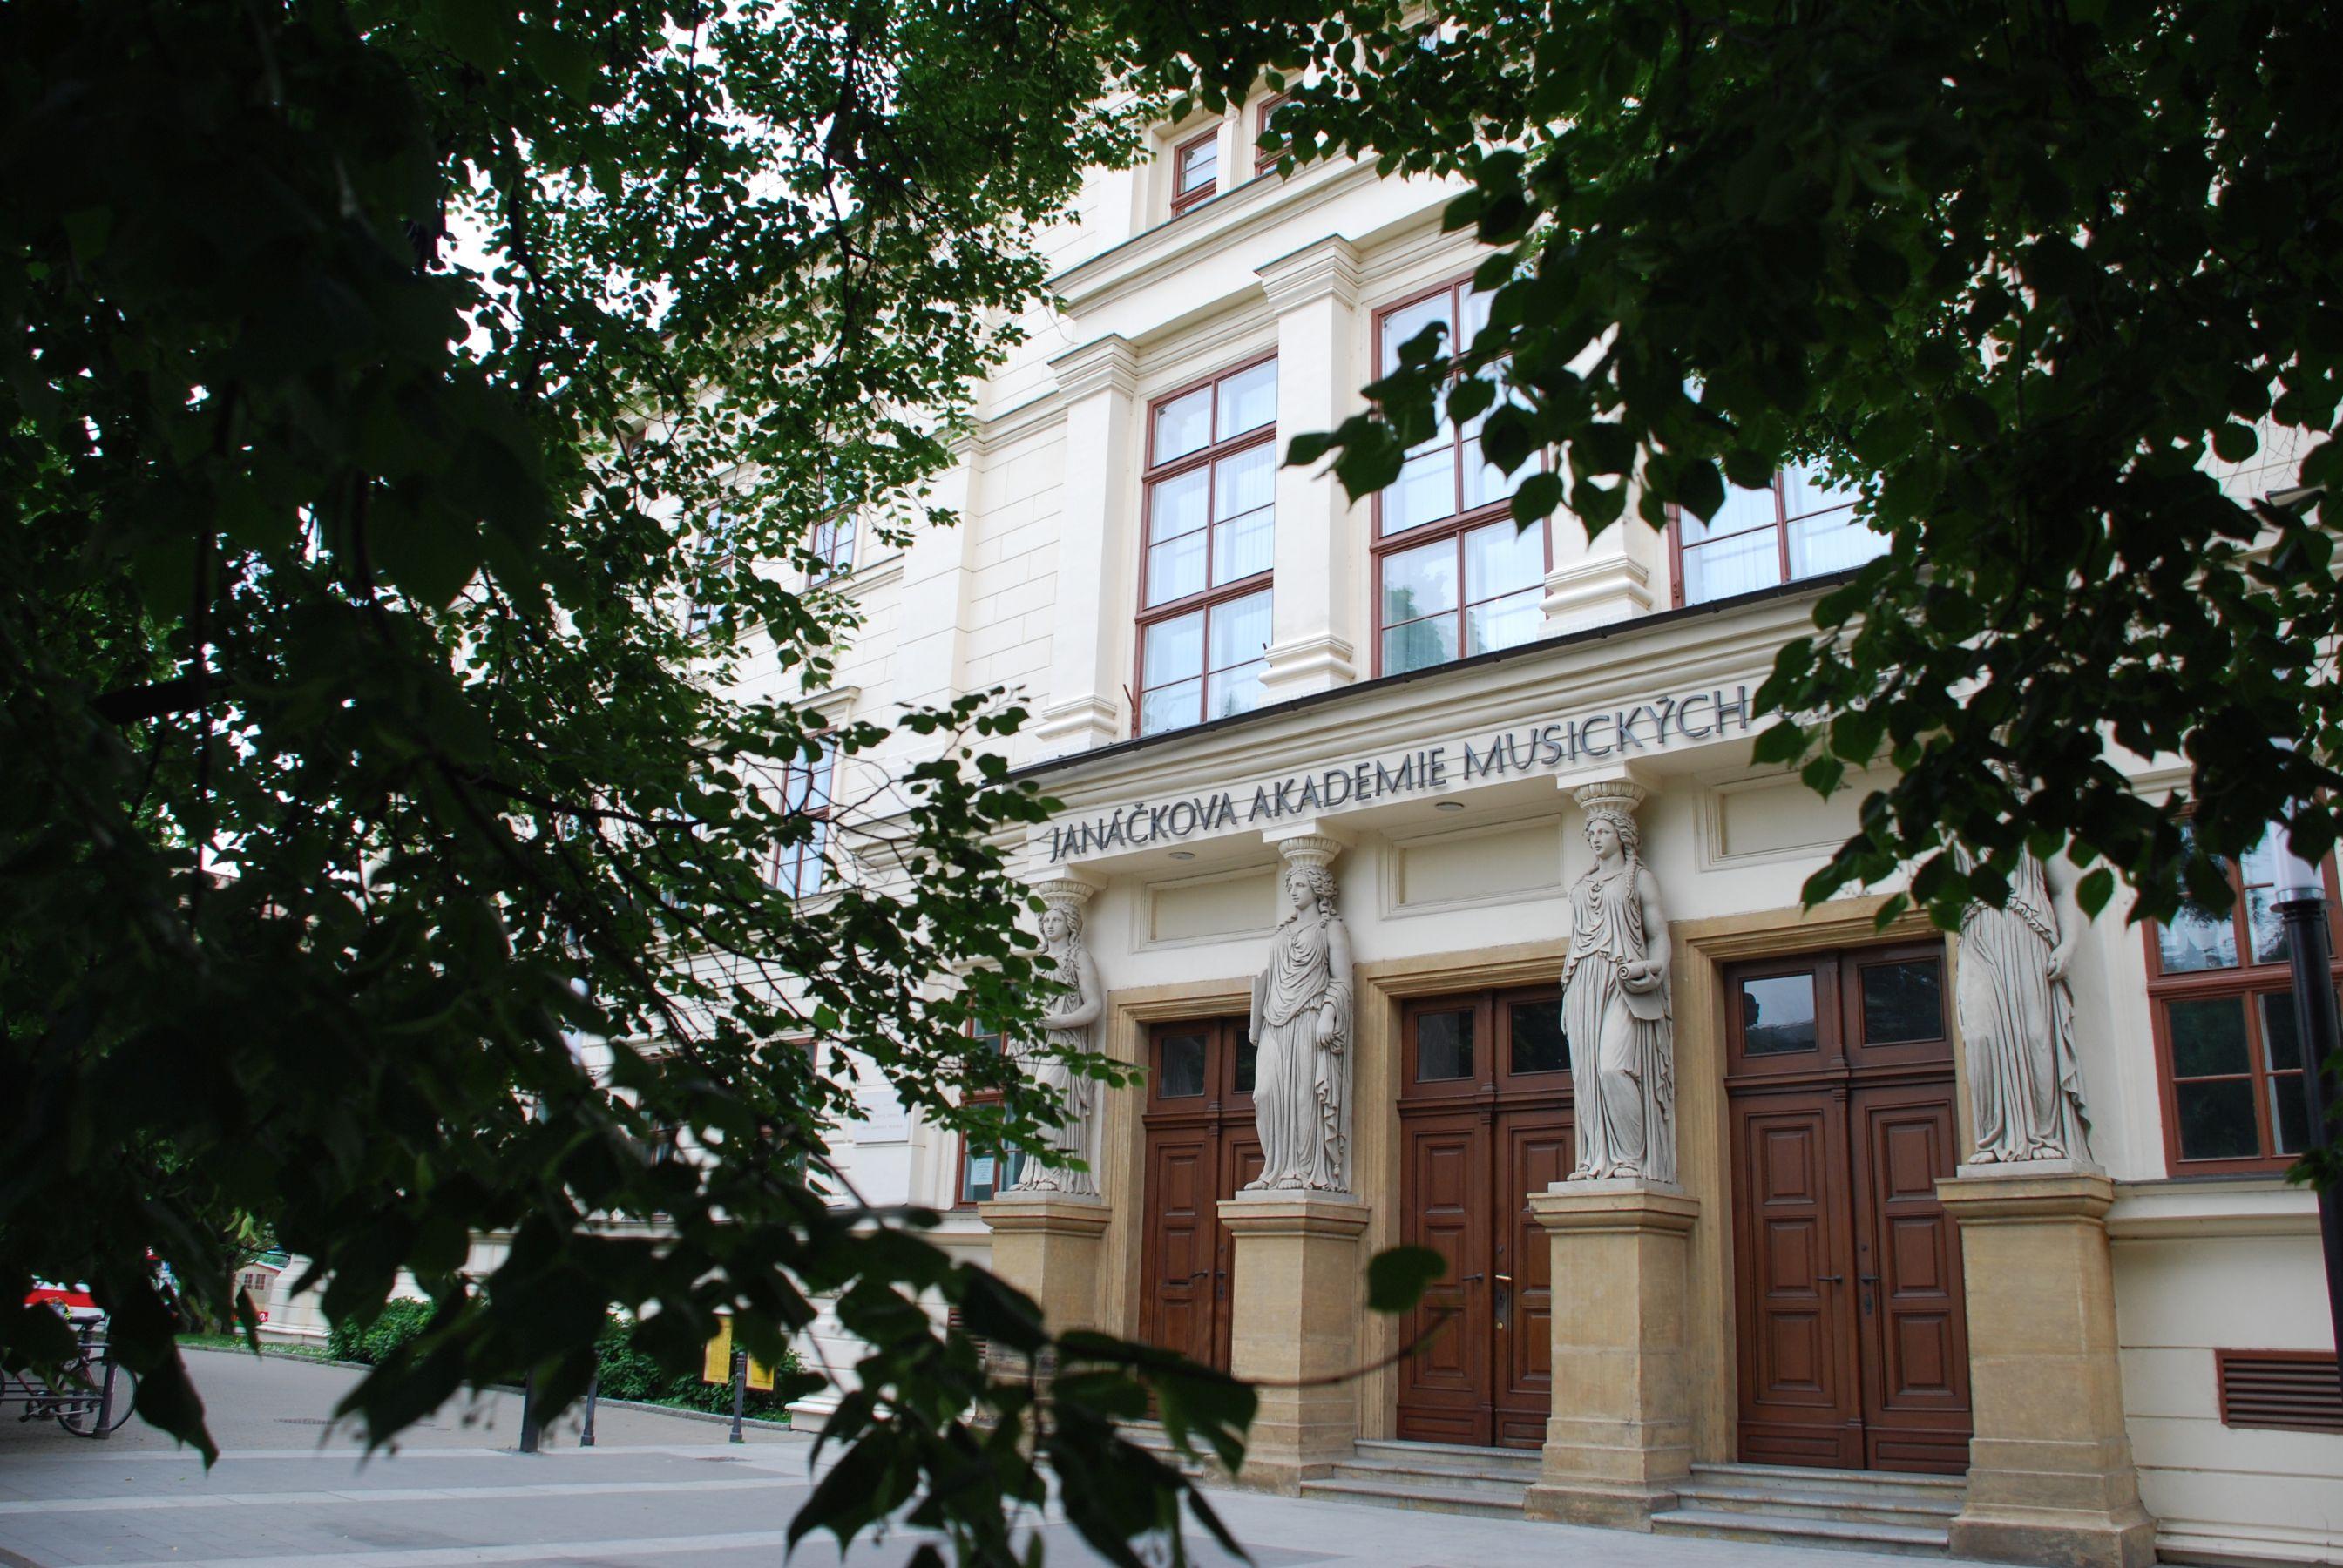 Faculty of Music of the Janáček Academy of Performing Arts in Brno (JAMU)